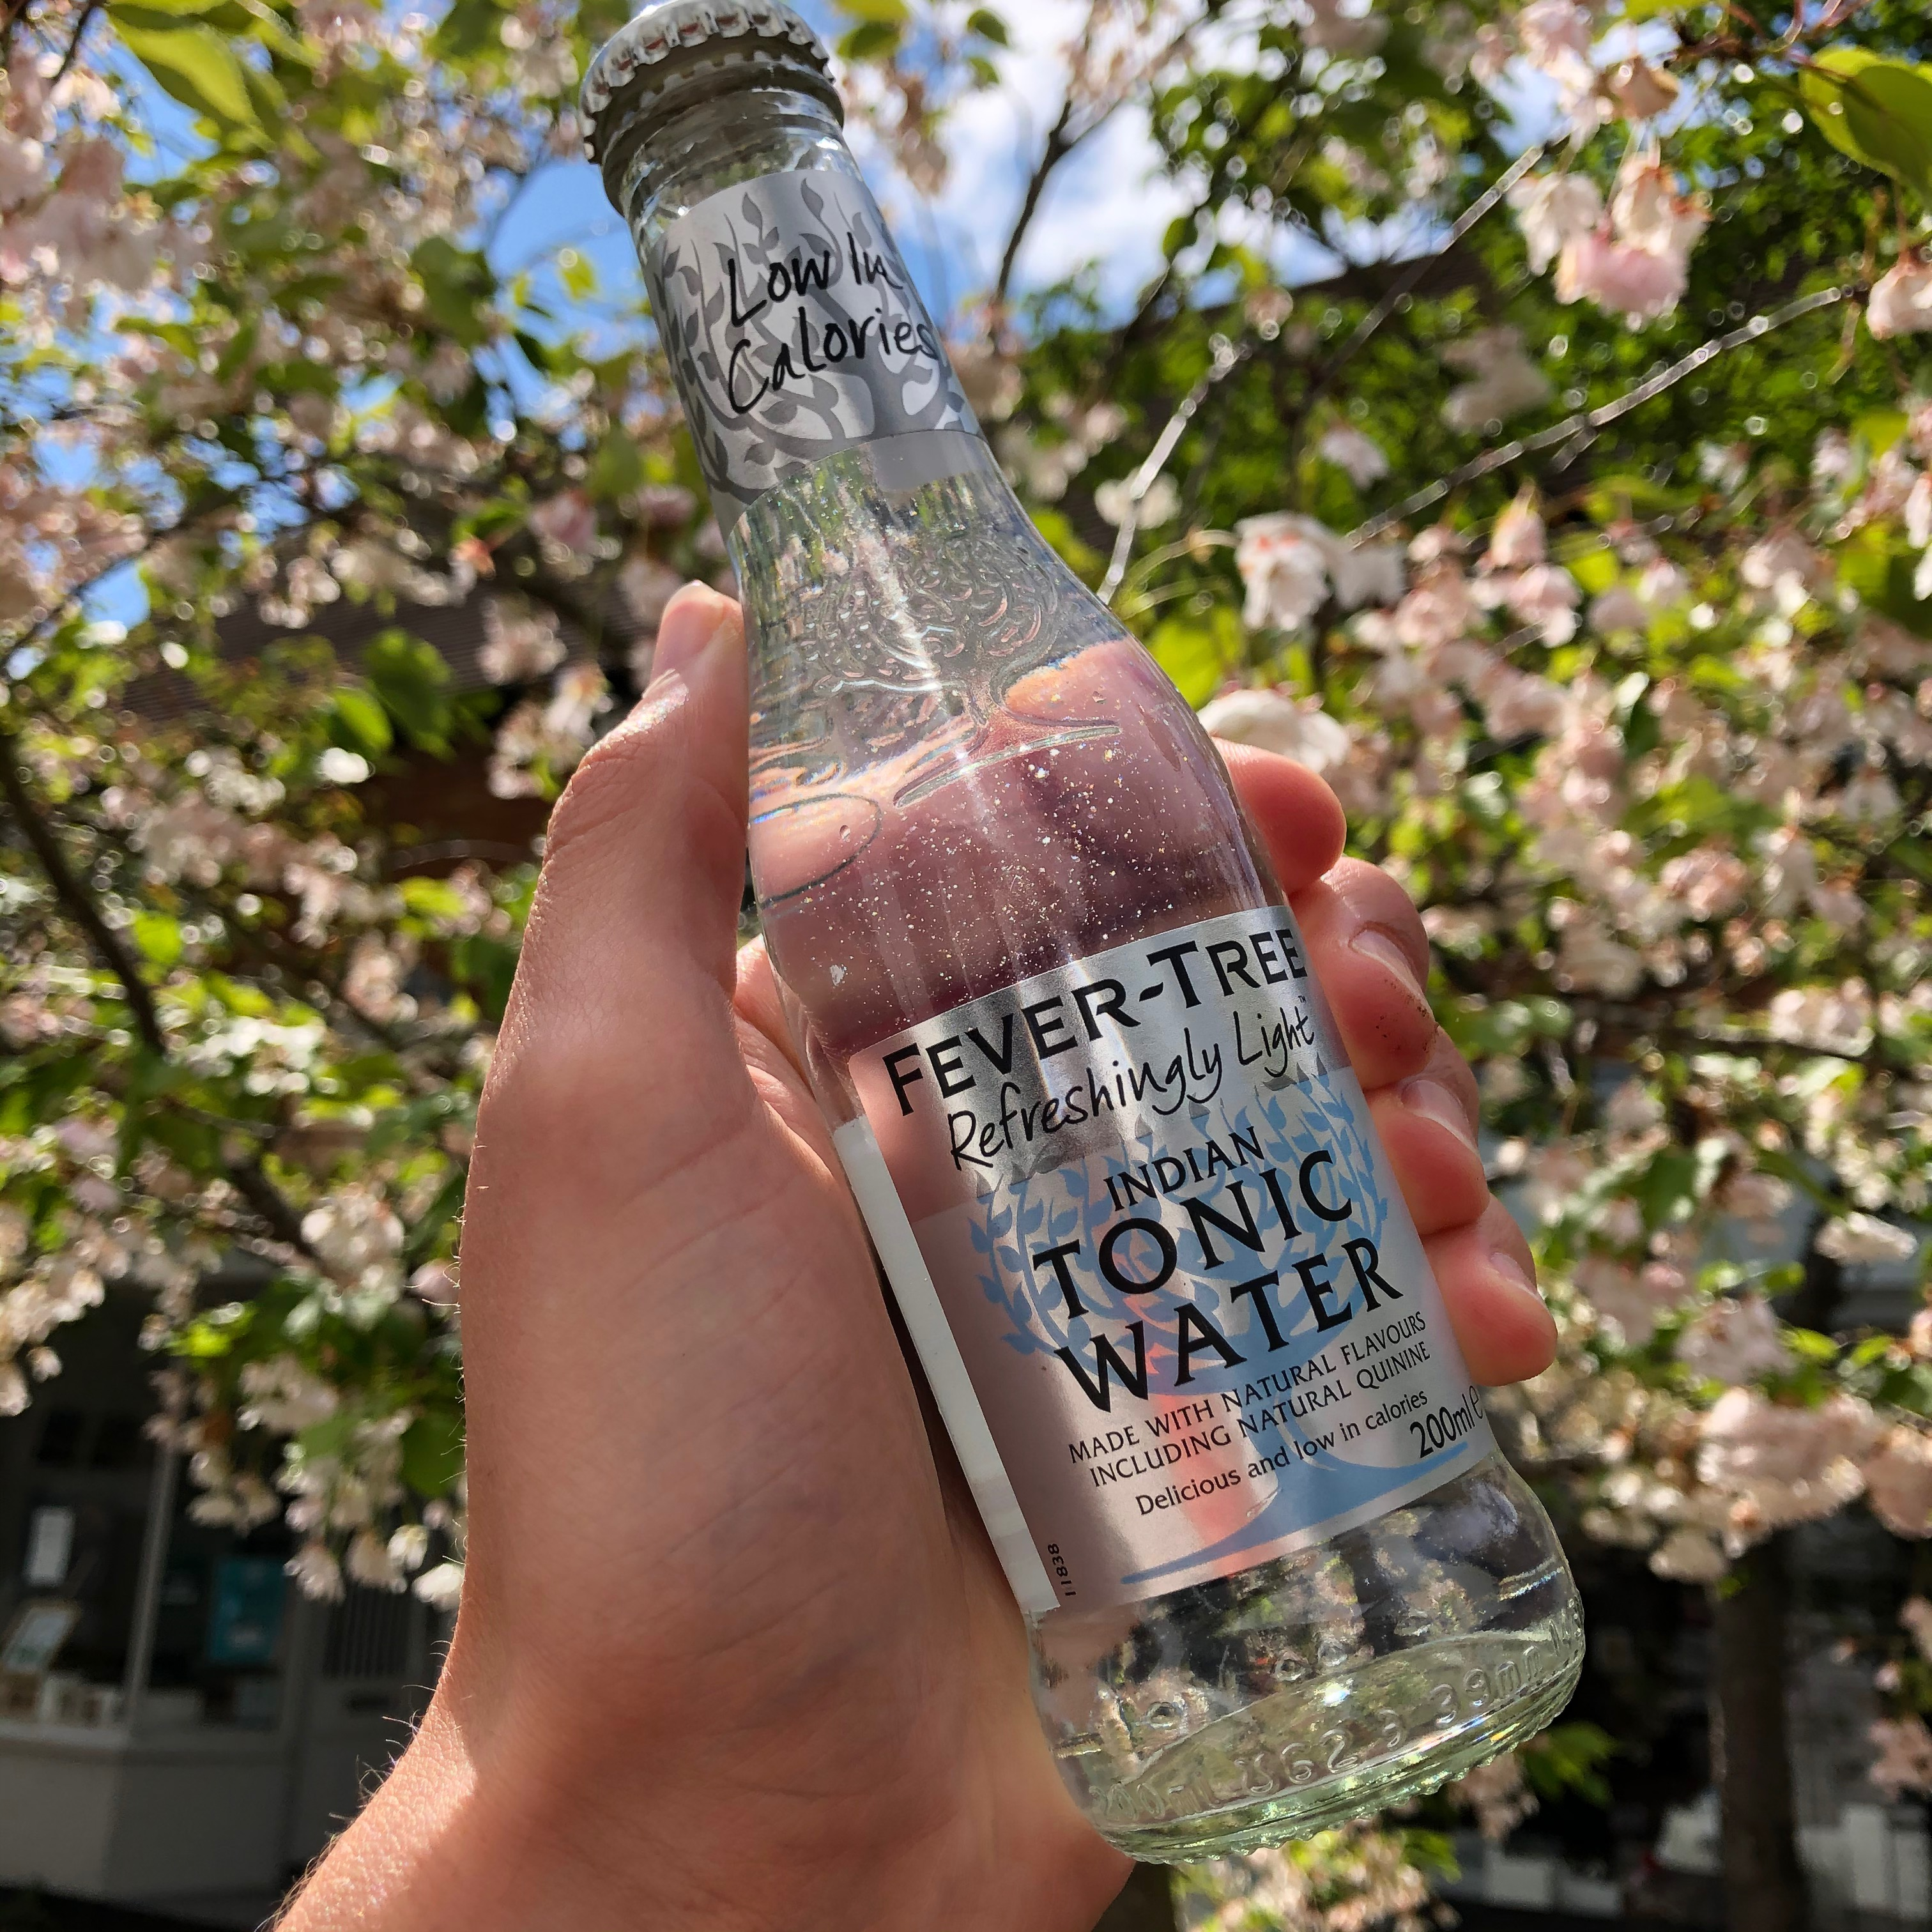 Fever Tree Light Tonic Water 200ml